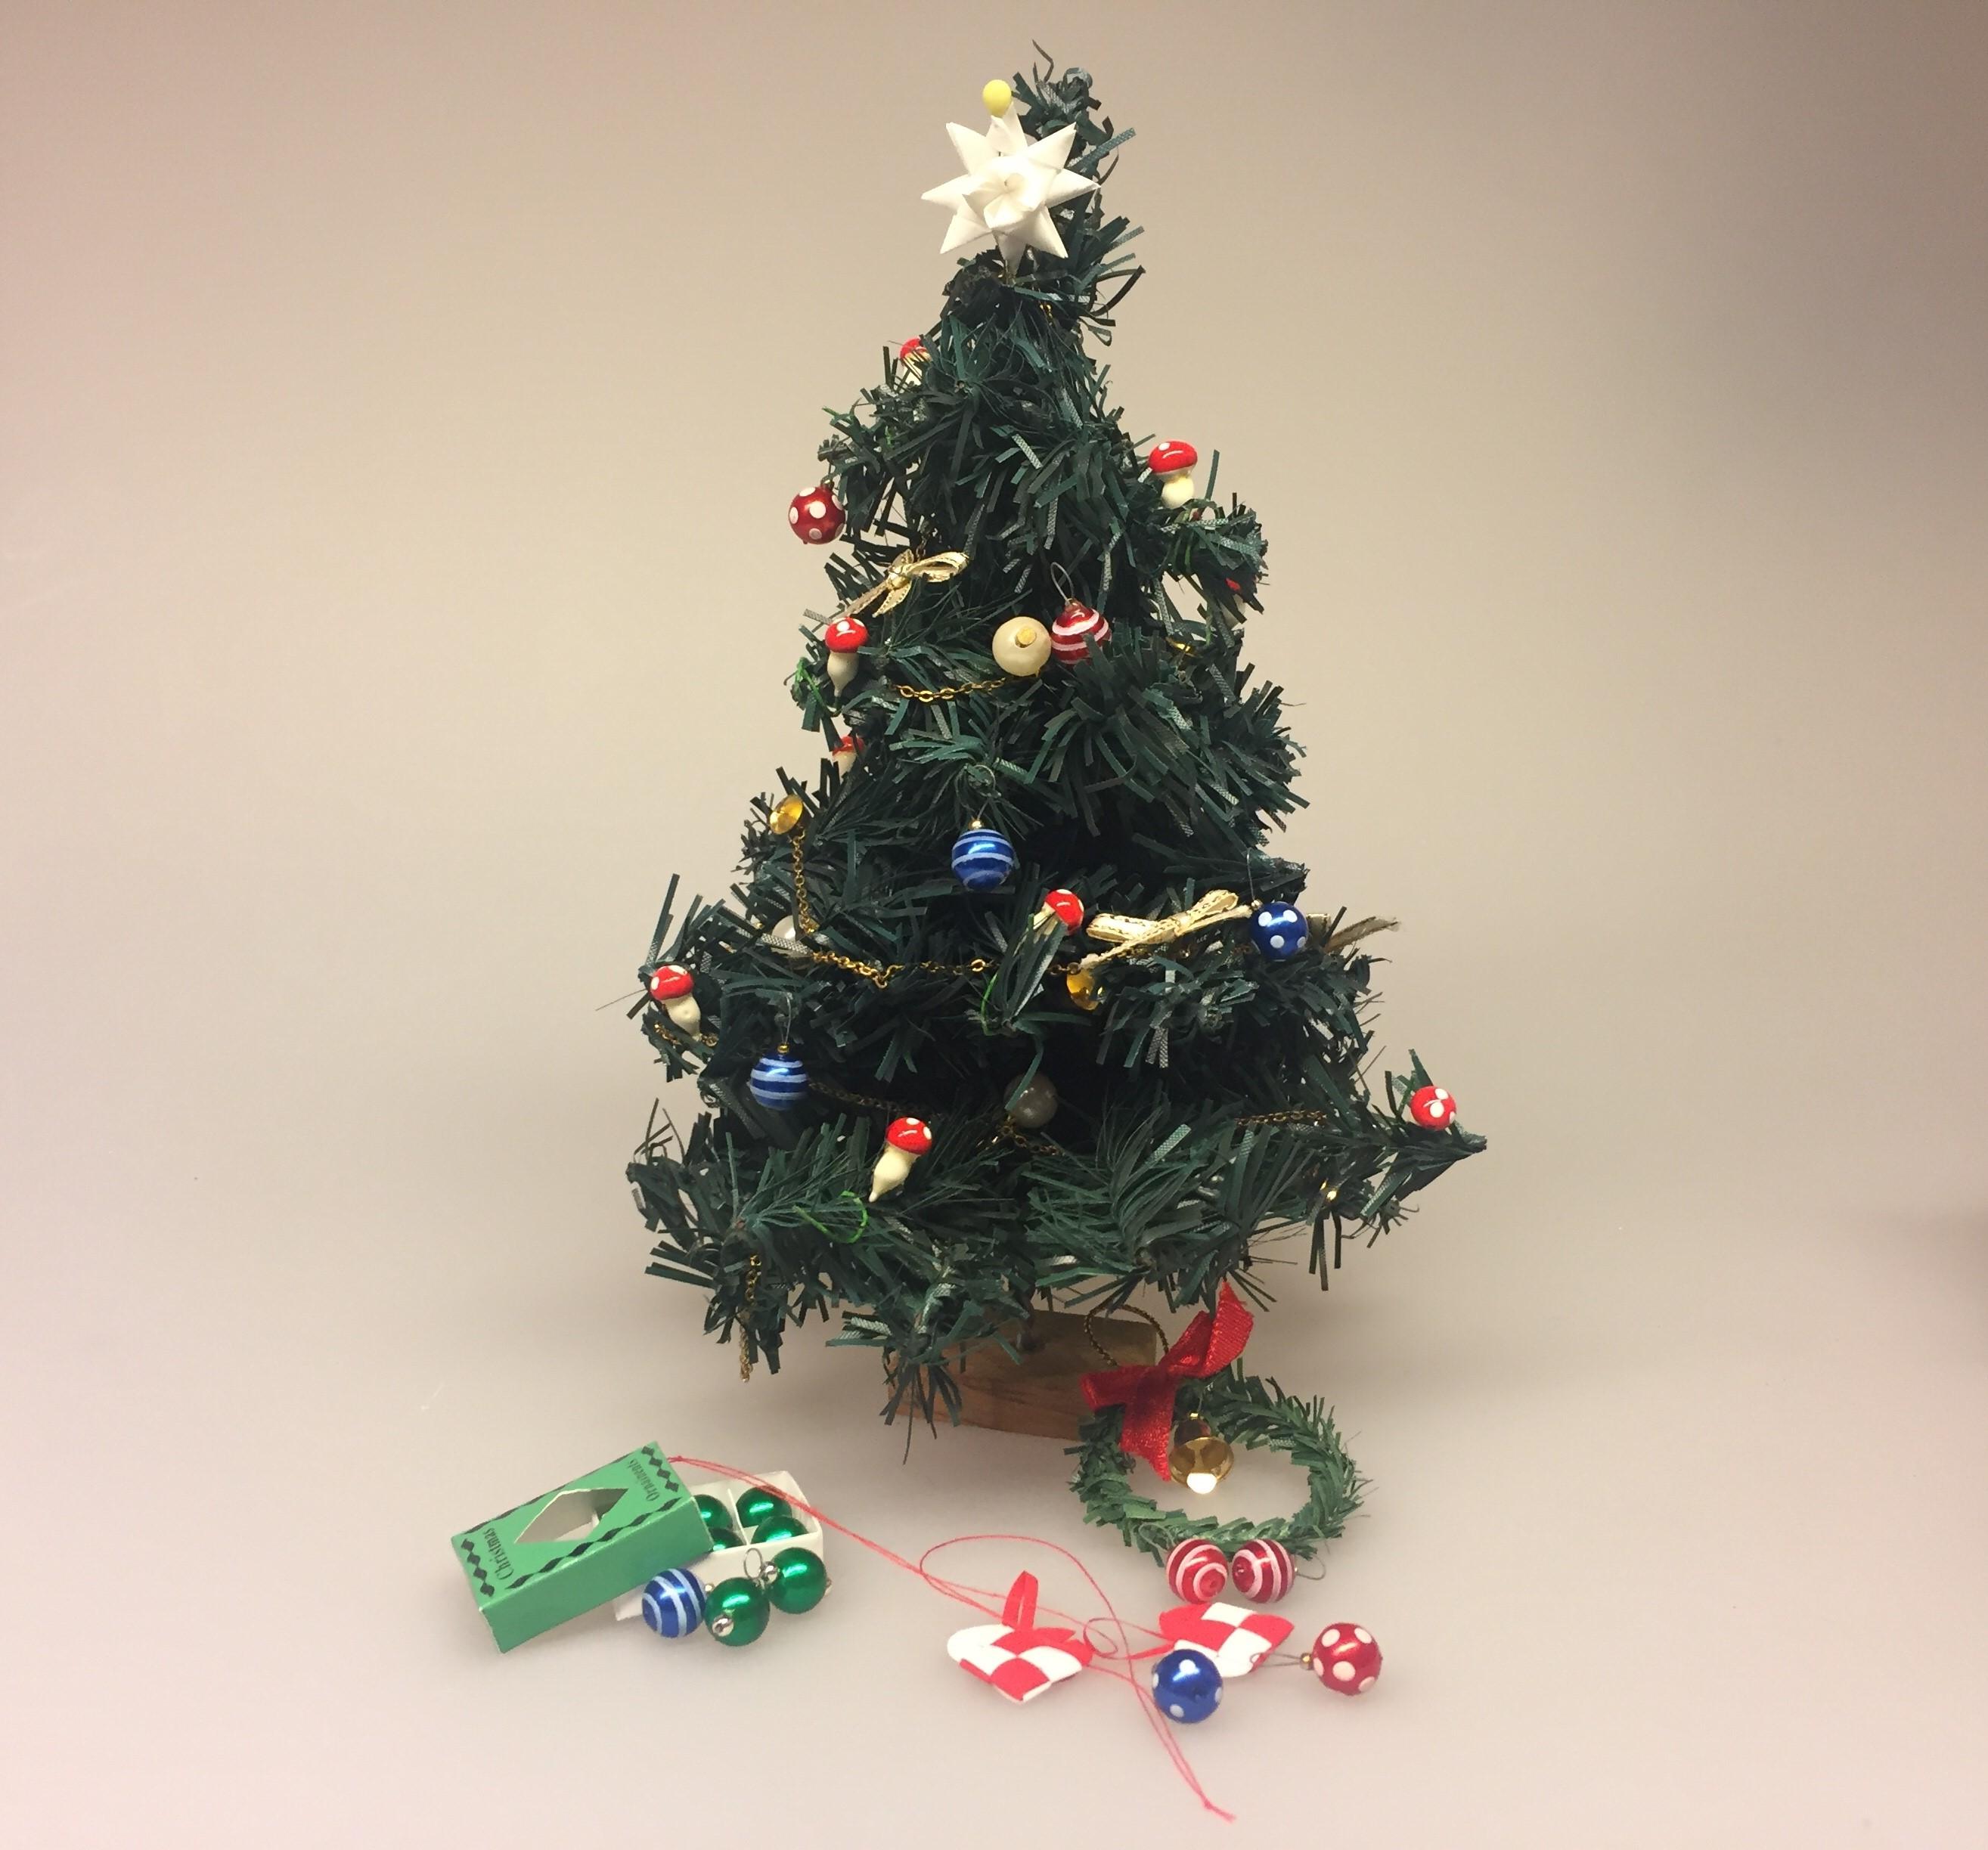 Miniature julepynt æske med julekugler, julepynt, glaskugler, æske, æske med julekugler, æske med glaskugler, glaskugler, dukkehus, dukkehusting, ting til, dukkehuset, miniaturer, nisserne, nissedør, nissebo, nissehus, julepynt, snelandskab, pynt, sætterkasse, sættekasseting, sætterkasseting, nisseting, nissetilbehør, biti, ribe